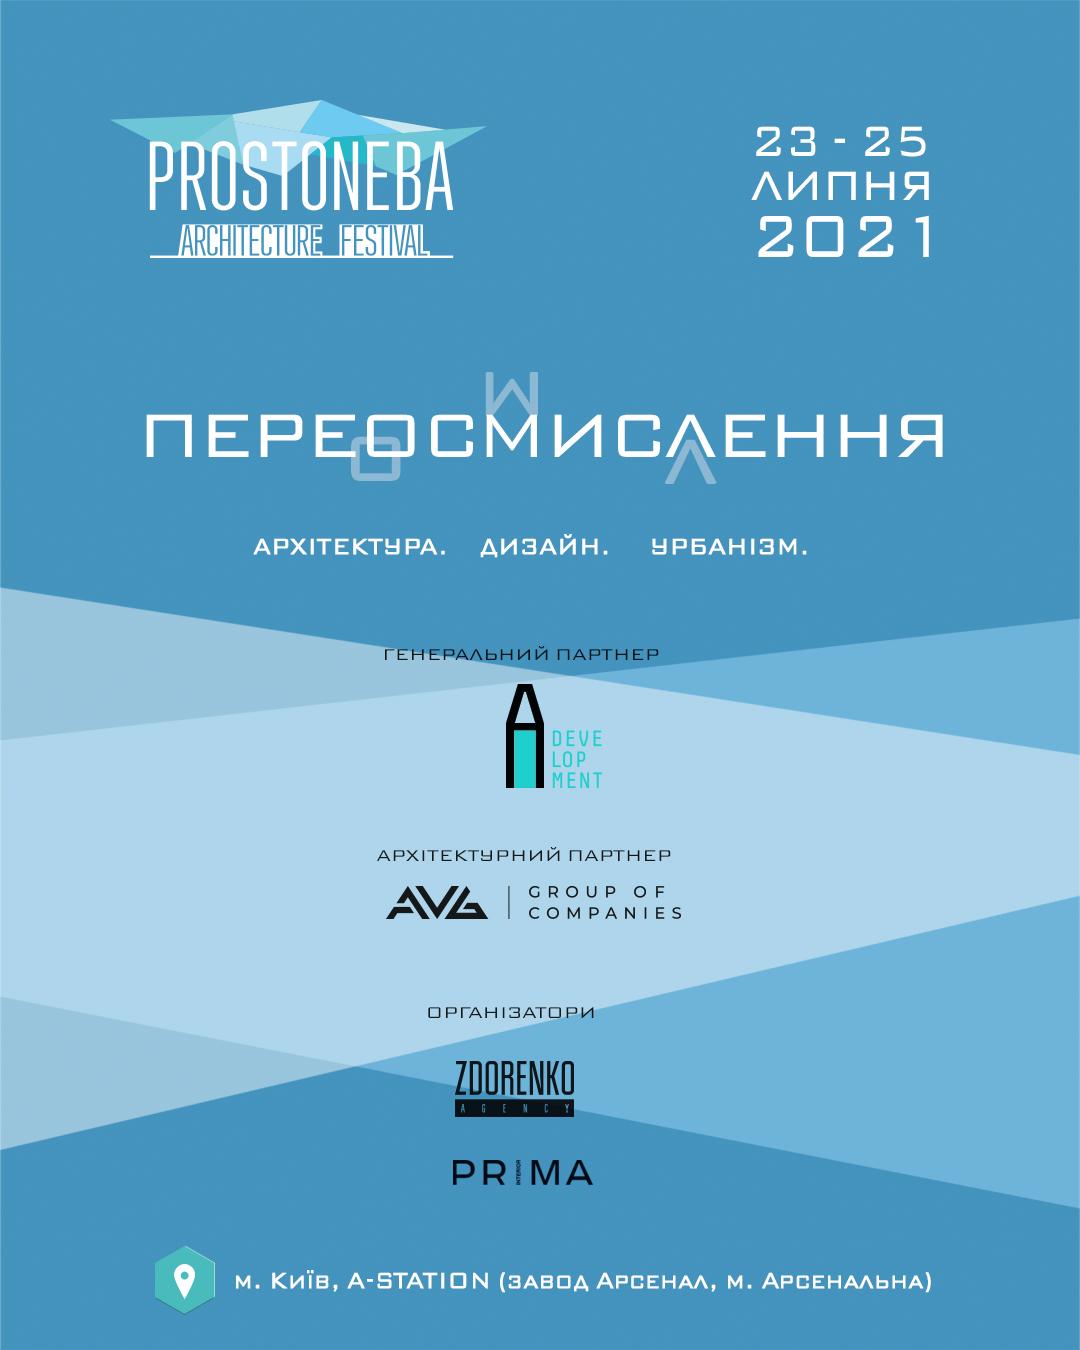 Всеукраїнський PROSTONEBA architecture festival